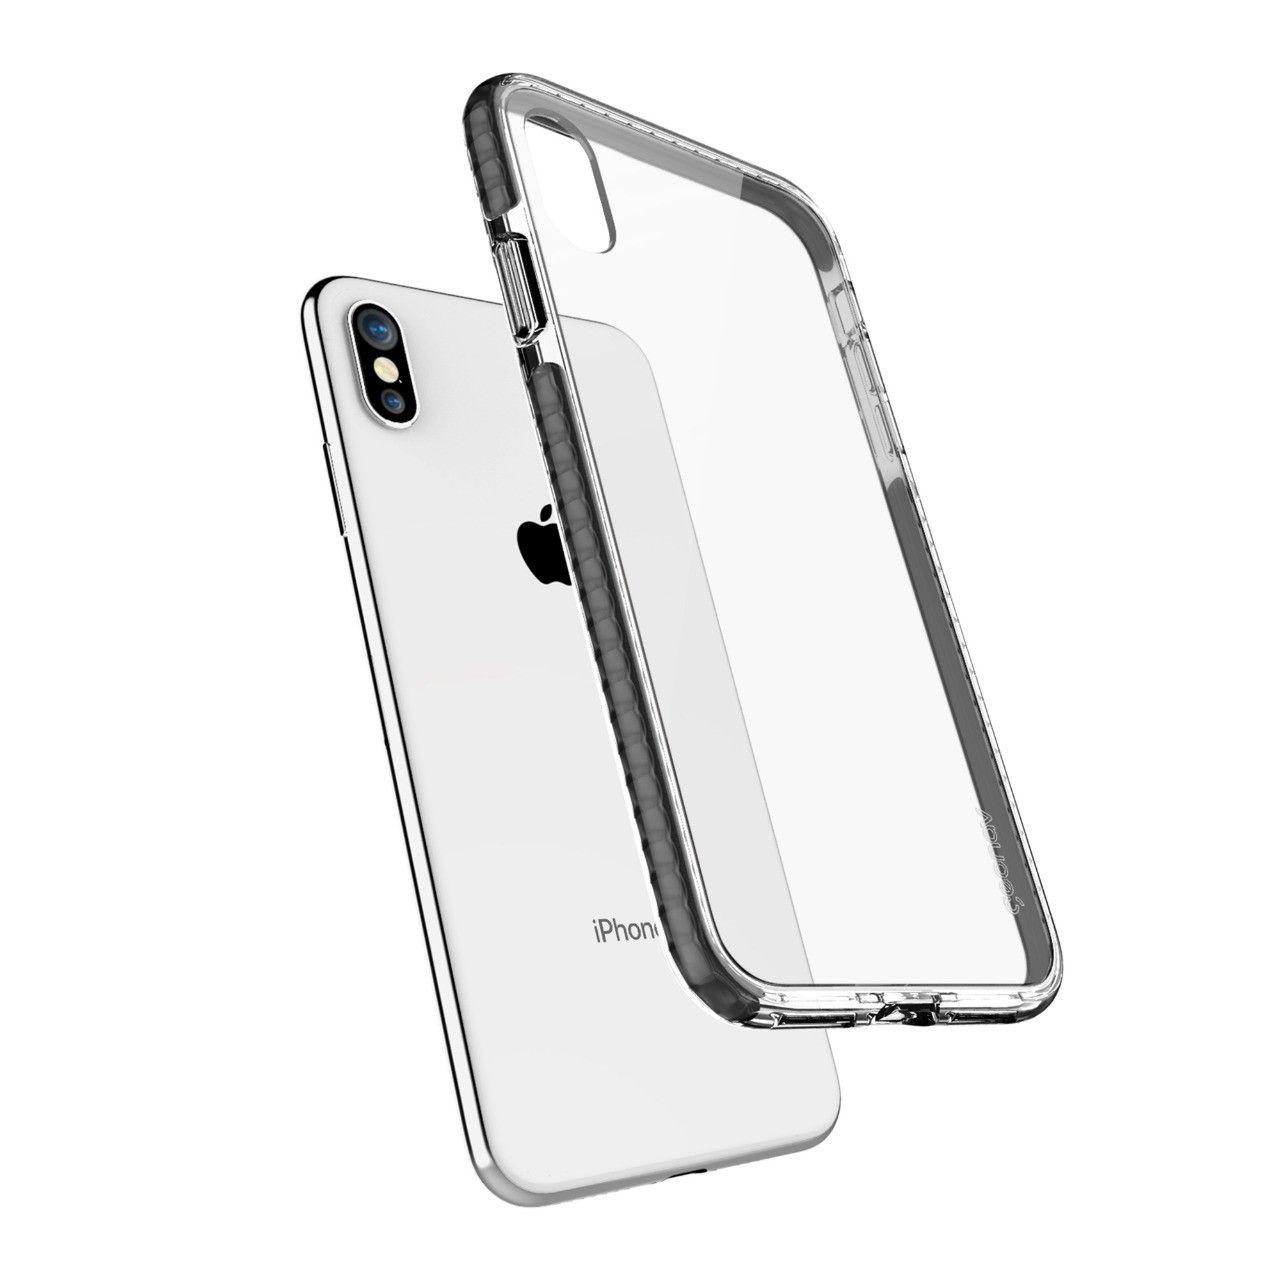 Capa Impact Pro X para Iphone XS MAX Black - IPIXMB - Geonav